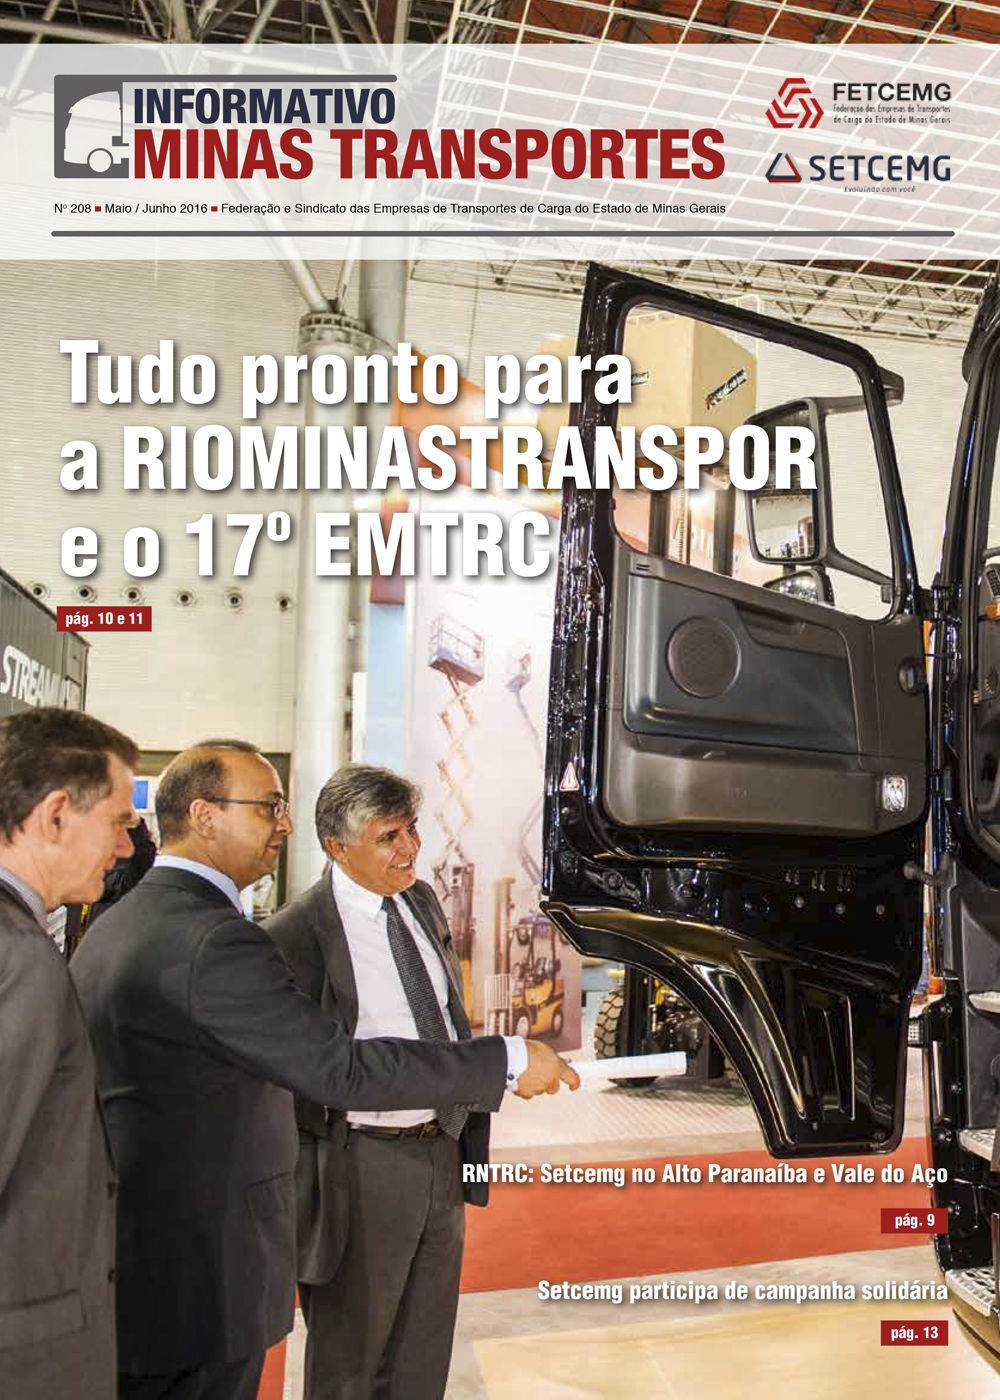 Informativo Minas Transportes - nº 208